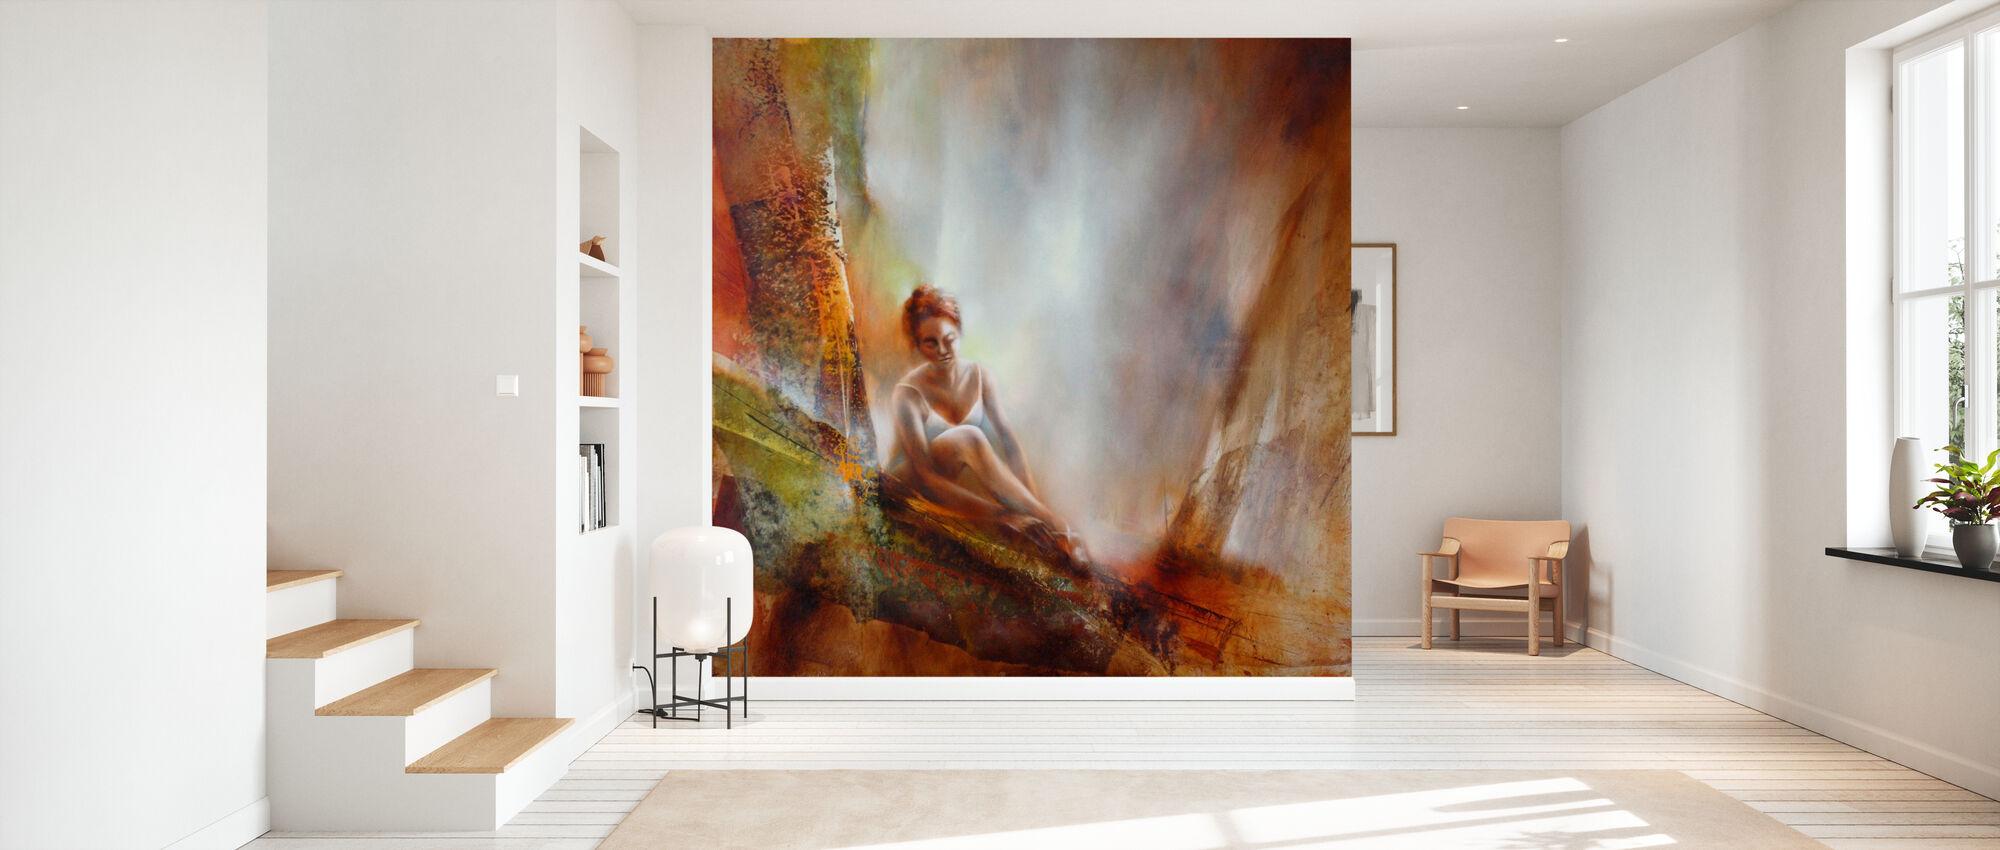 Before the Dance - Wallpaper - Hallway